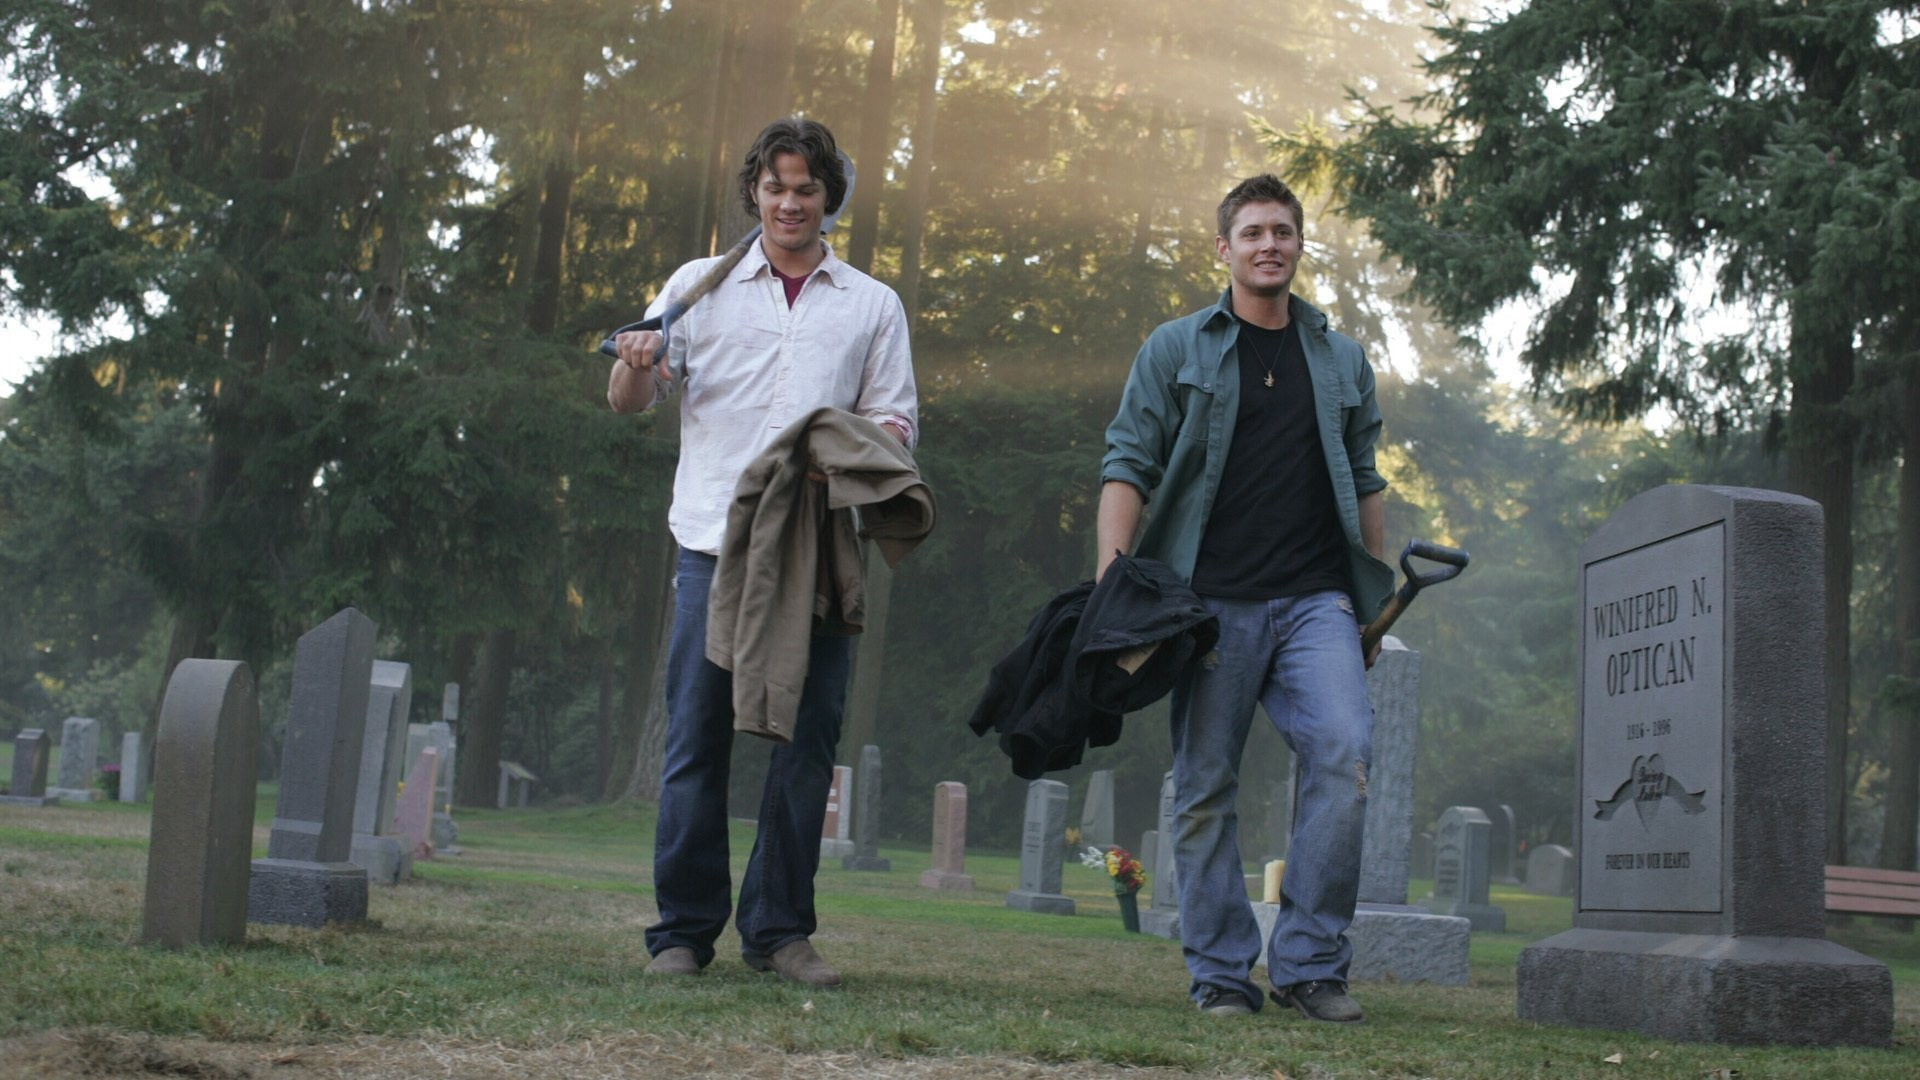 supernatural supernatural tv series winchester brothers dean sam jared  padalecki jensen ackles jensen ackles jared padalecki